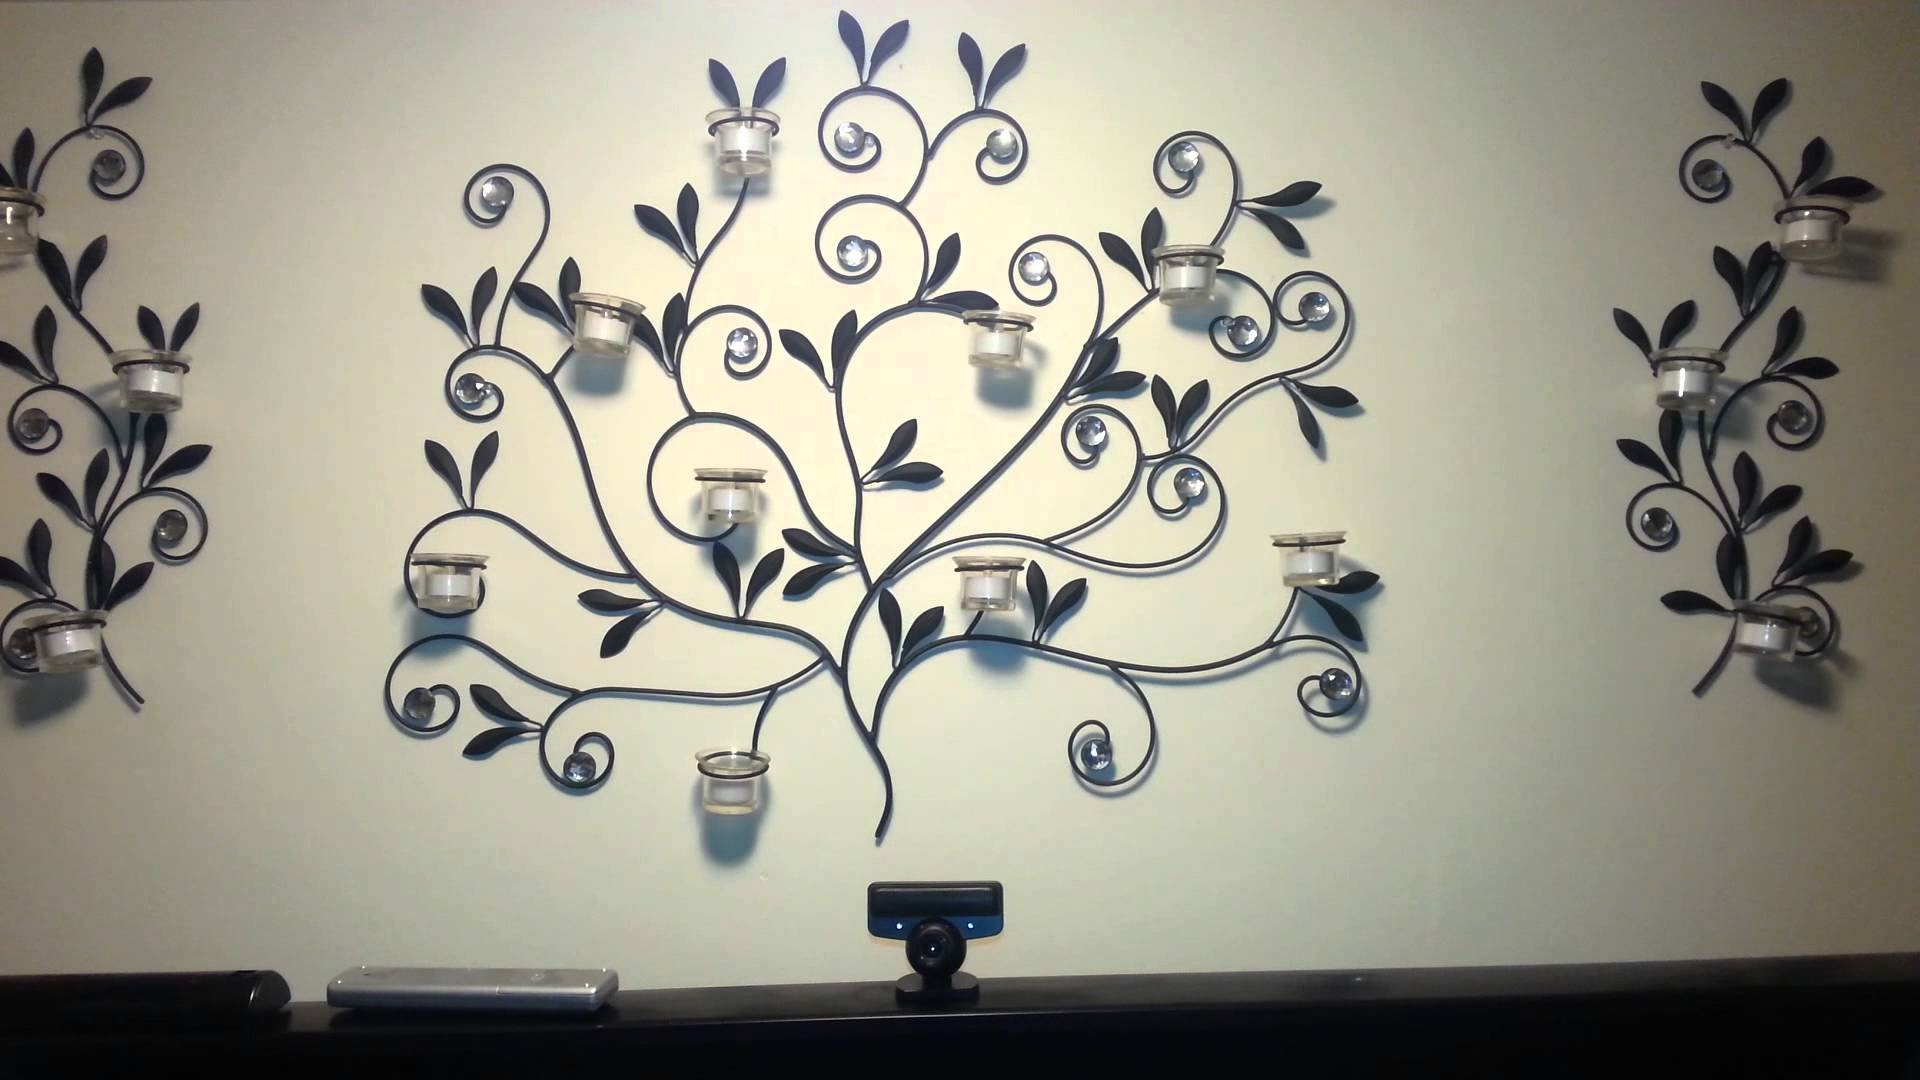 Walmart Metal Wall Art – Youtube With Regard To Recent Walmart Metal Wall Art (View 1 of 30)